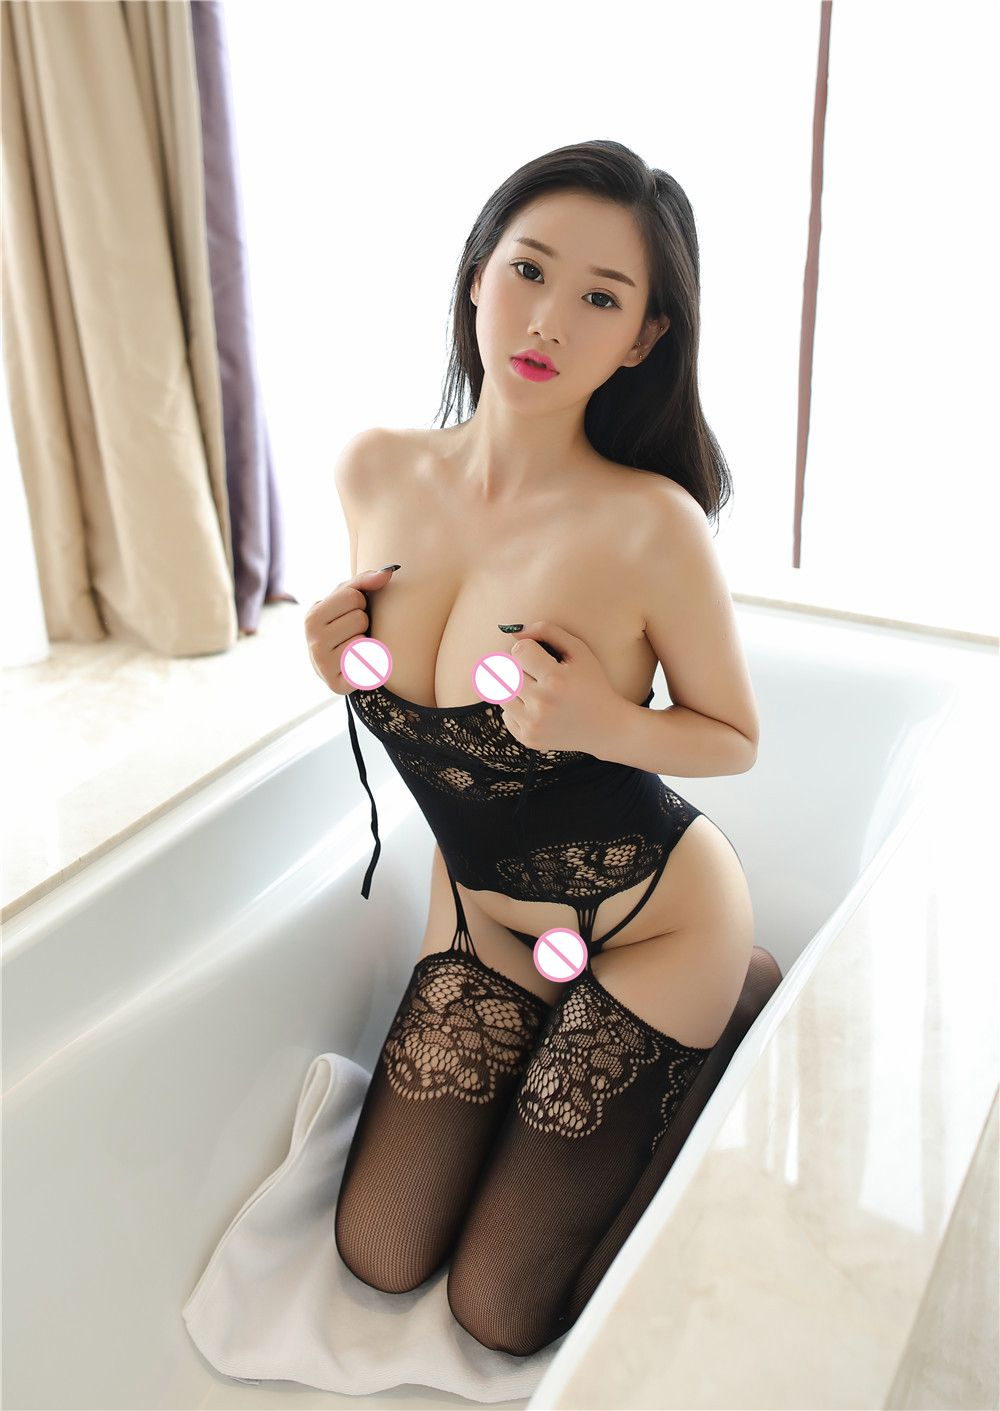 Buy 2018 Women Sexy Lingerie Plus Size Hot Erotic Underwear Babydoll Fishnet Sleepwear exy Costumes Lenceria Erotica Mujer Sexi